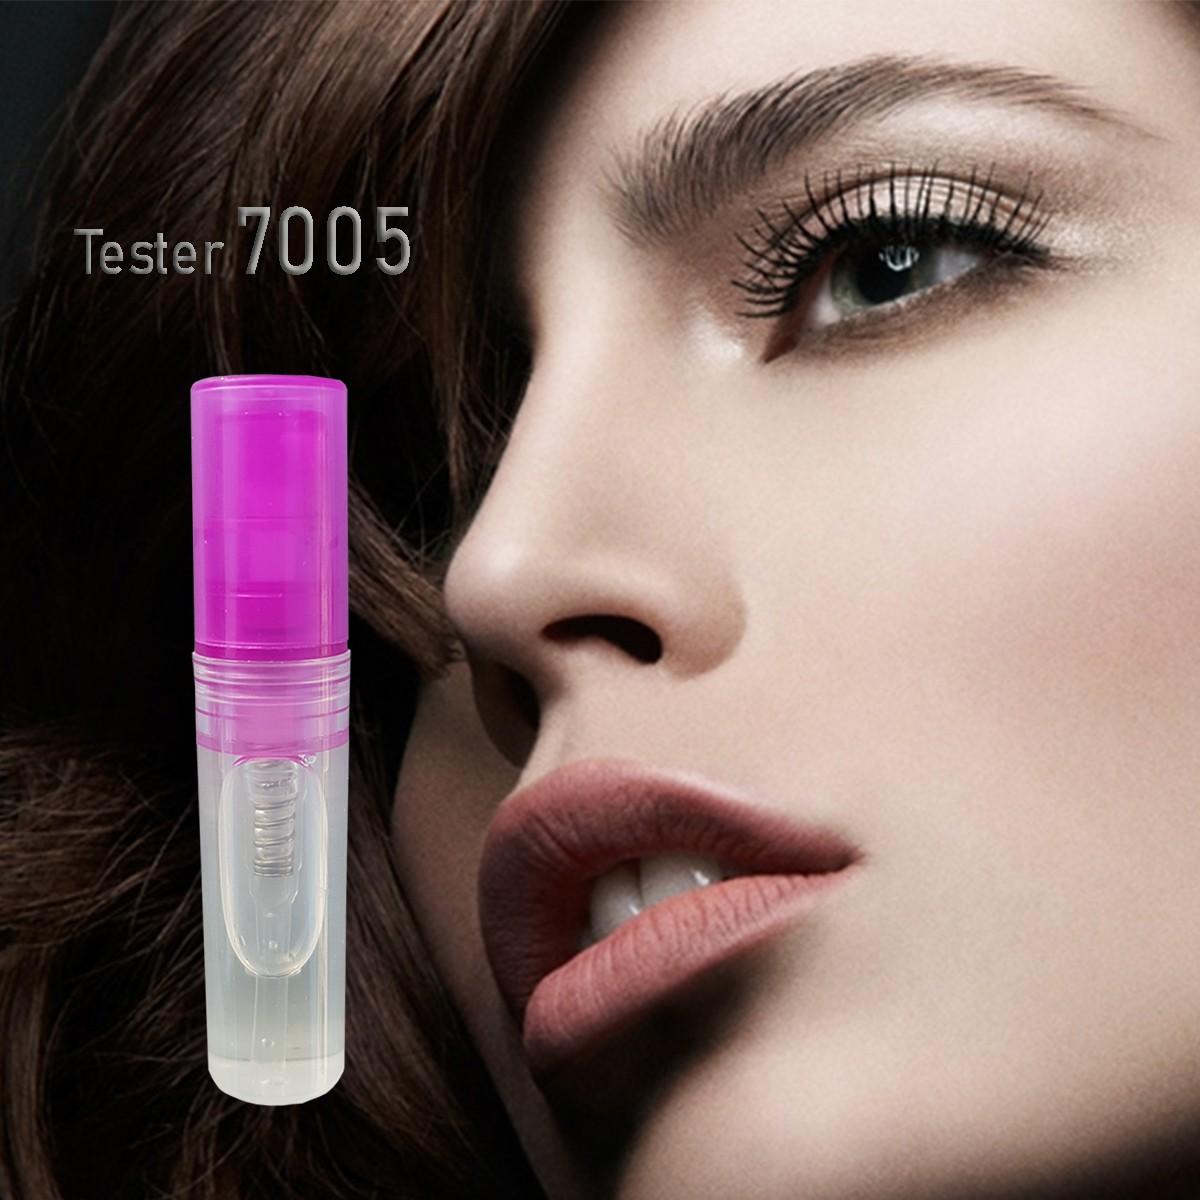 Tester7005